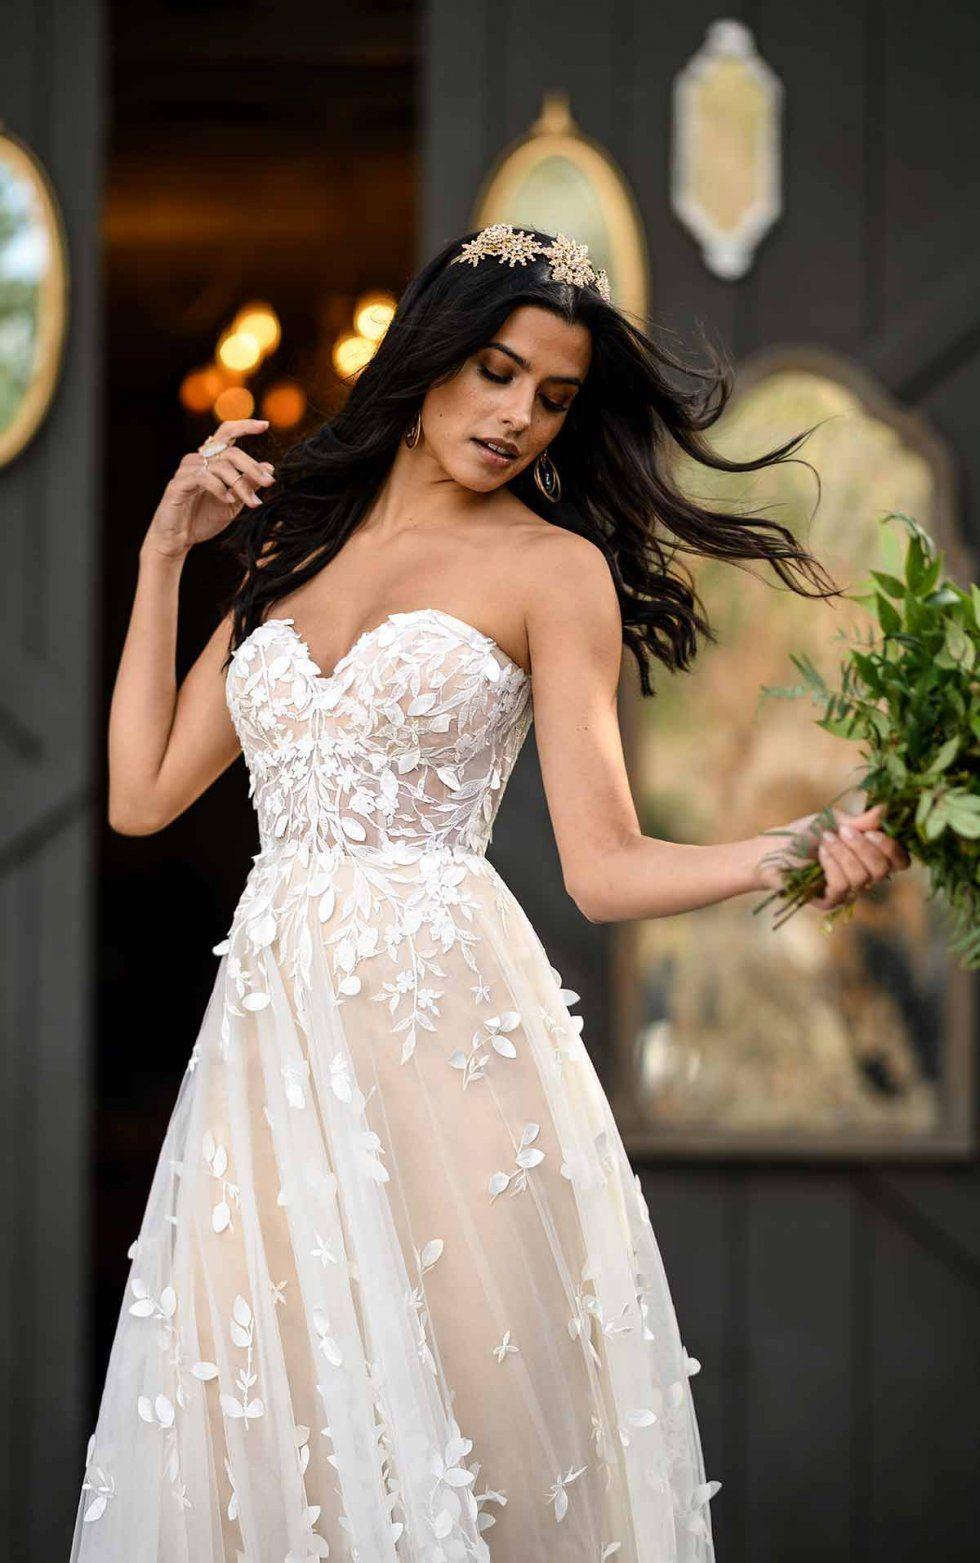 Strapless ALine Boho Wedding Gown With OrganicShaped